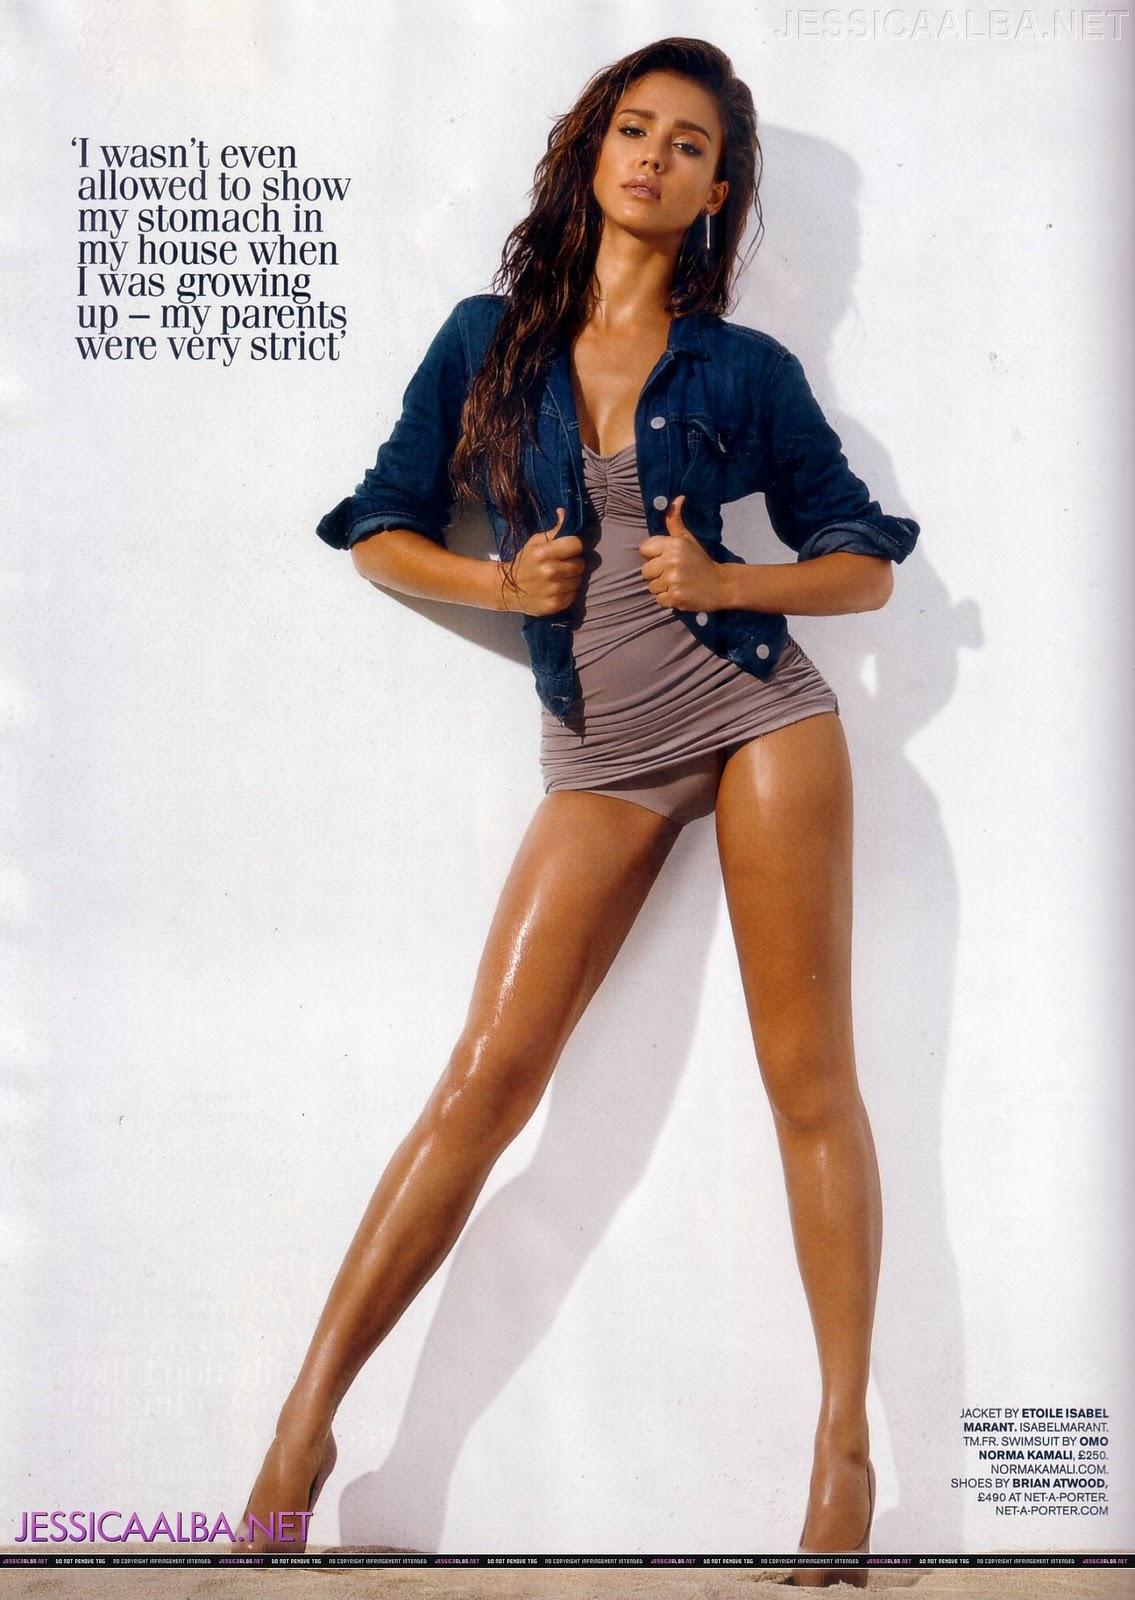 http://4.bp.blogspot.com/_Dak_-l9vCck/TK512P4E4RI/AAAAAAAABaY/pXNZ86J0sos/s1600/Jessica-Alba-21.jpg